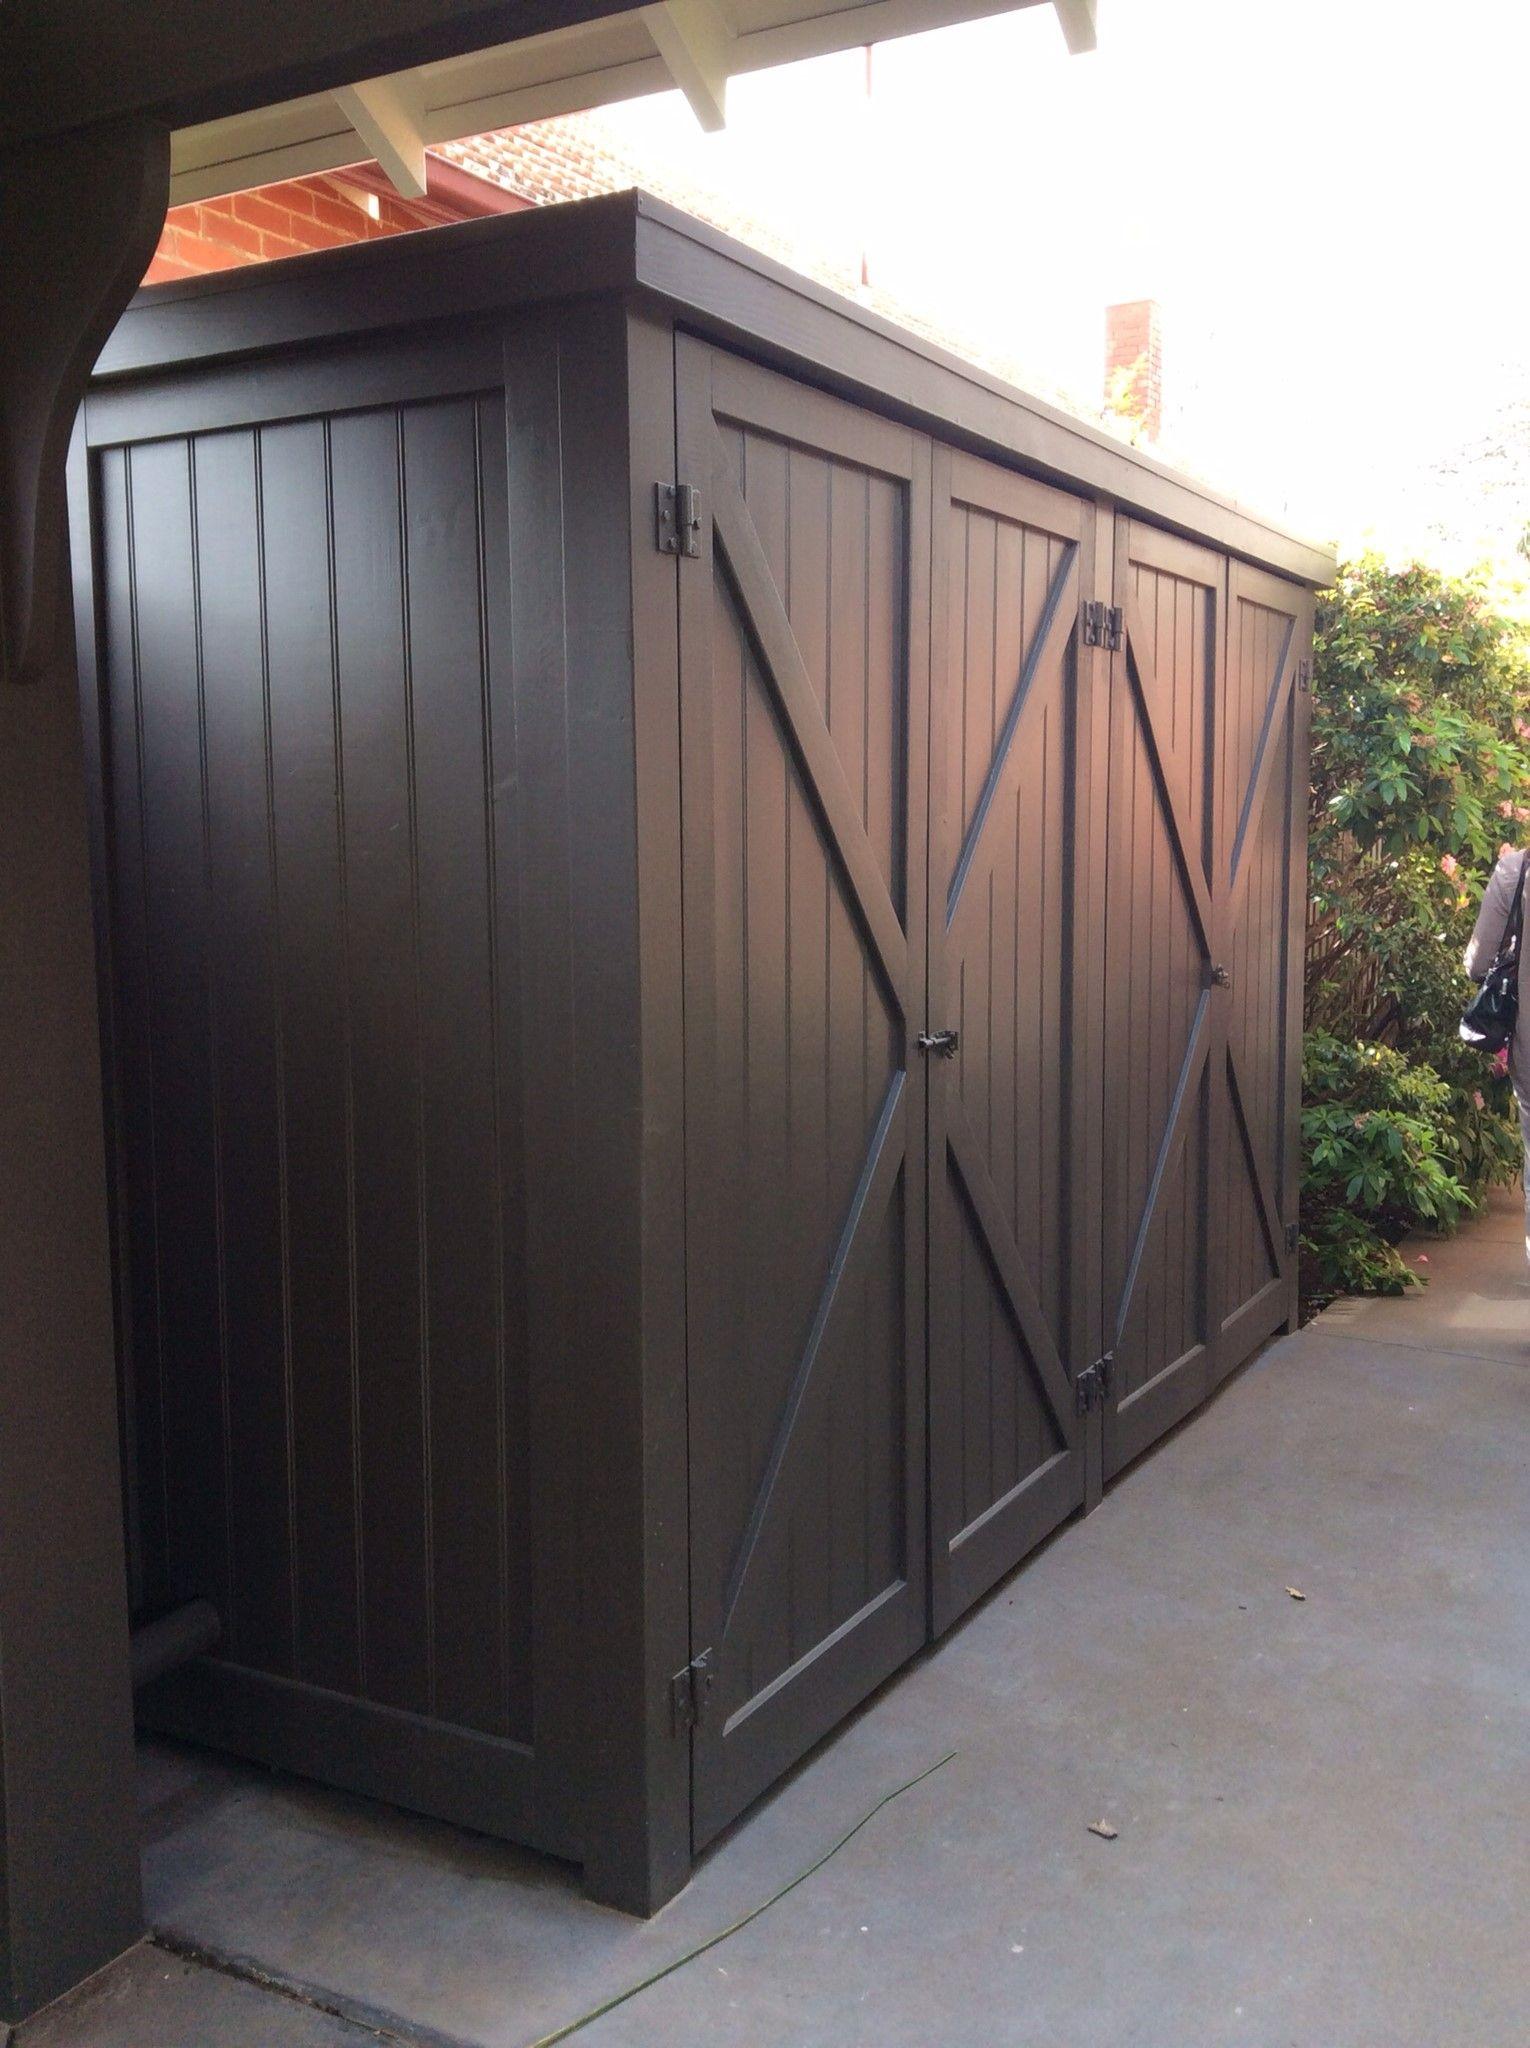 Carport Idea. Bank Of Storage Cupboards To Store Mower, Garden Tools Etc.  .. (back Part) | Organization | Pinterest | Carport Ideas, Cupboard And  Banks